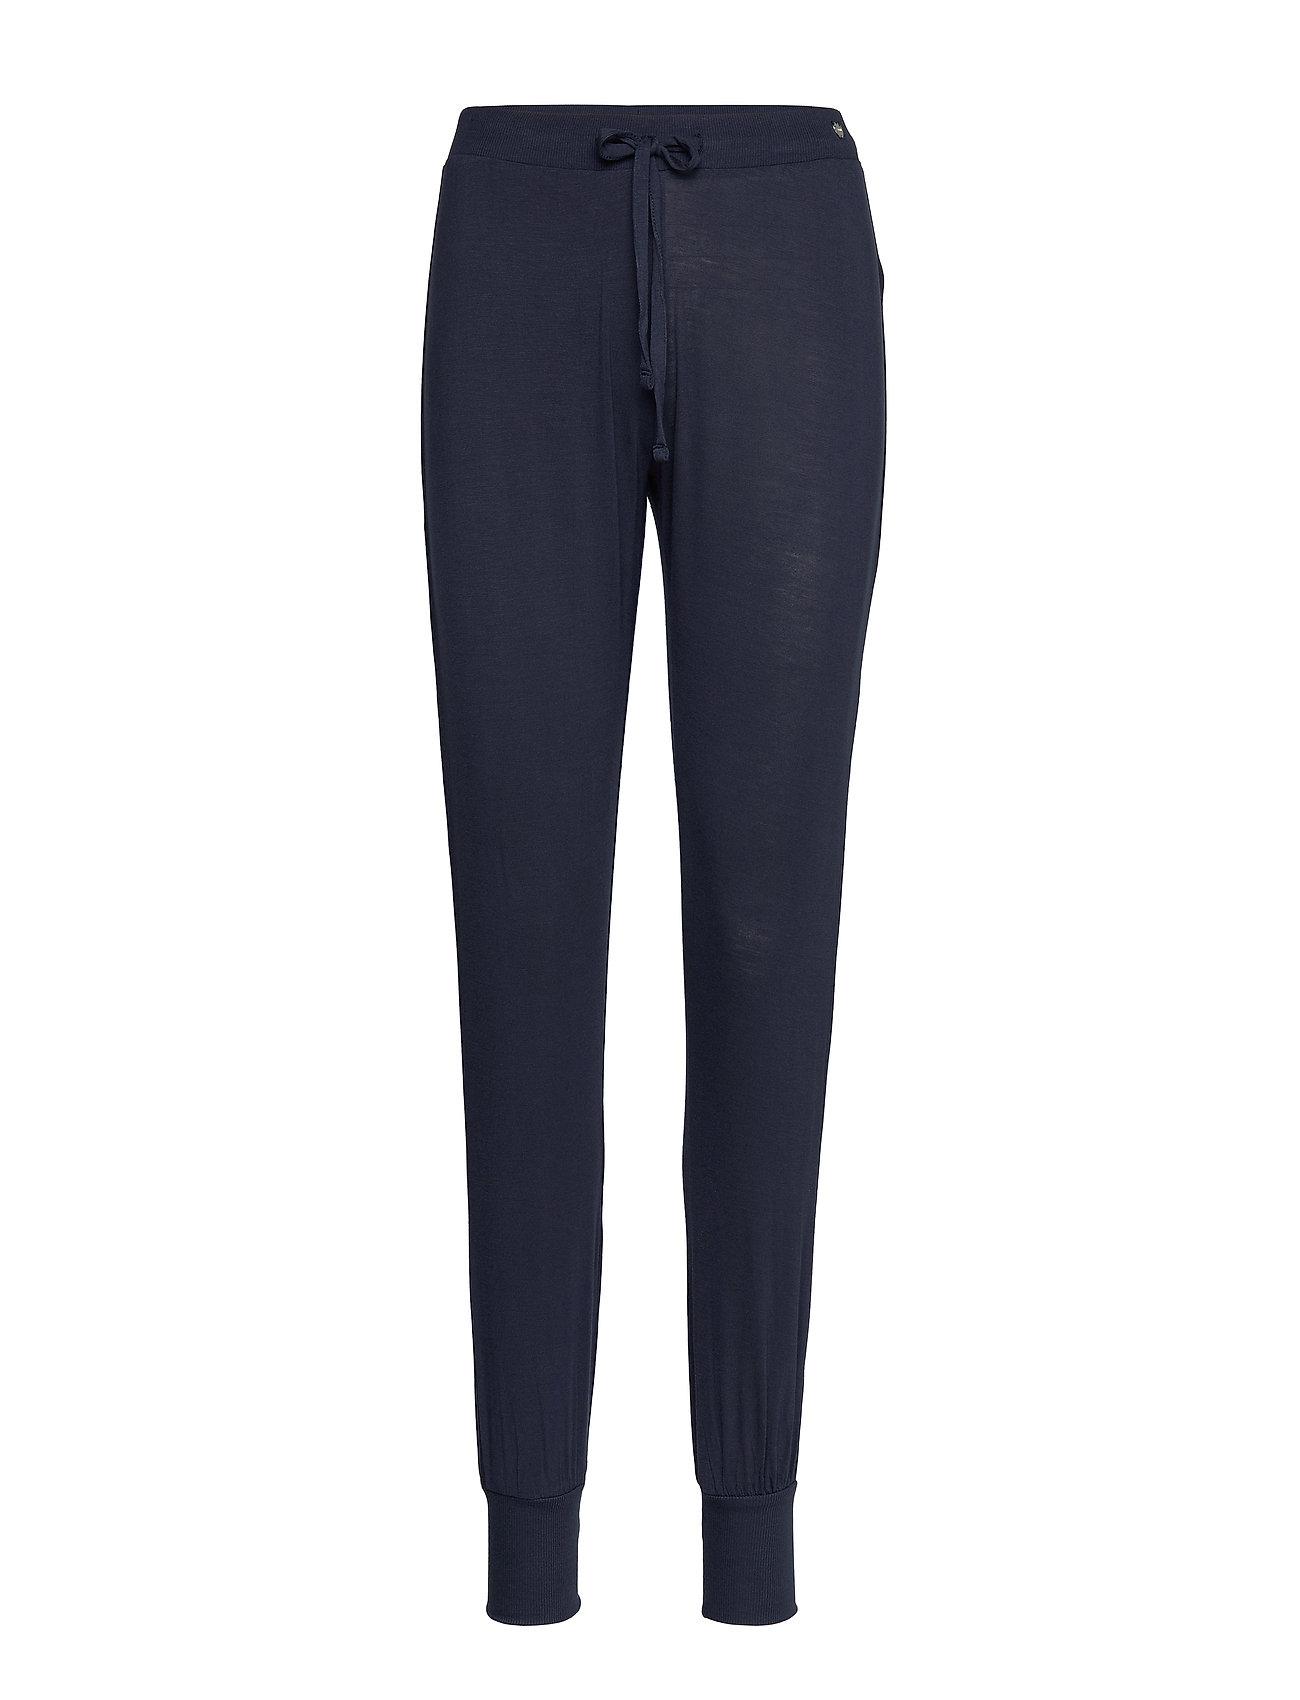 Esprit Bodywear Women Nightpants - NAVY